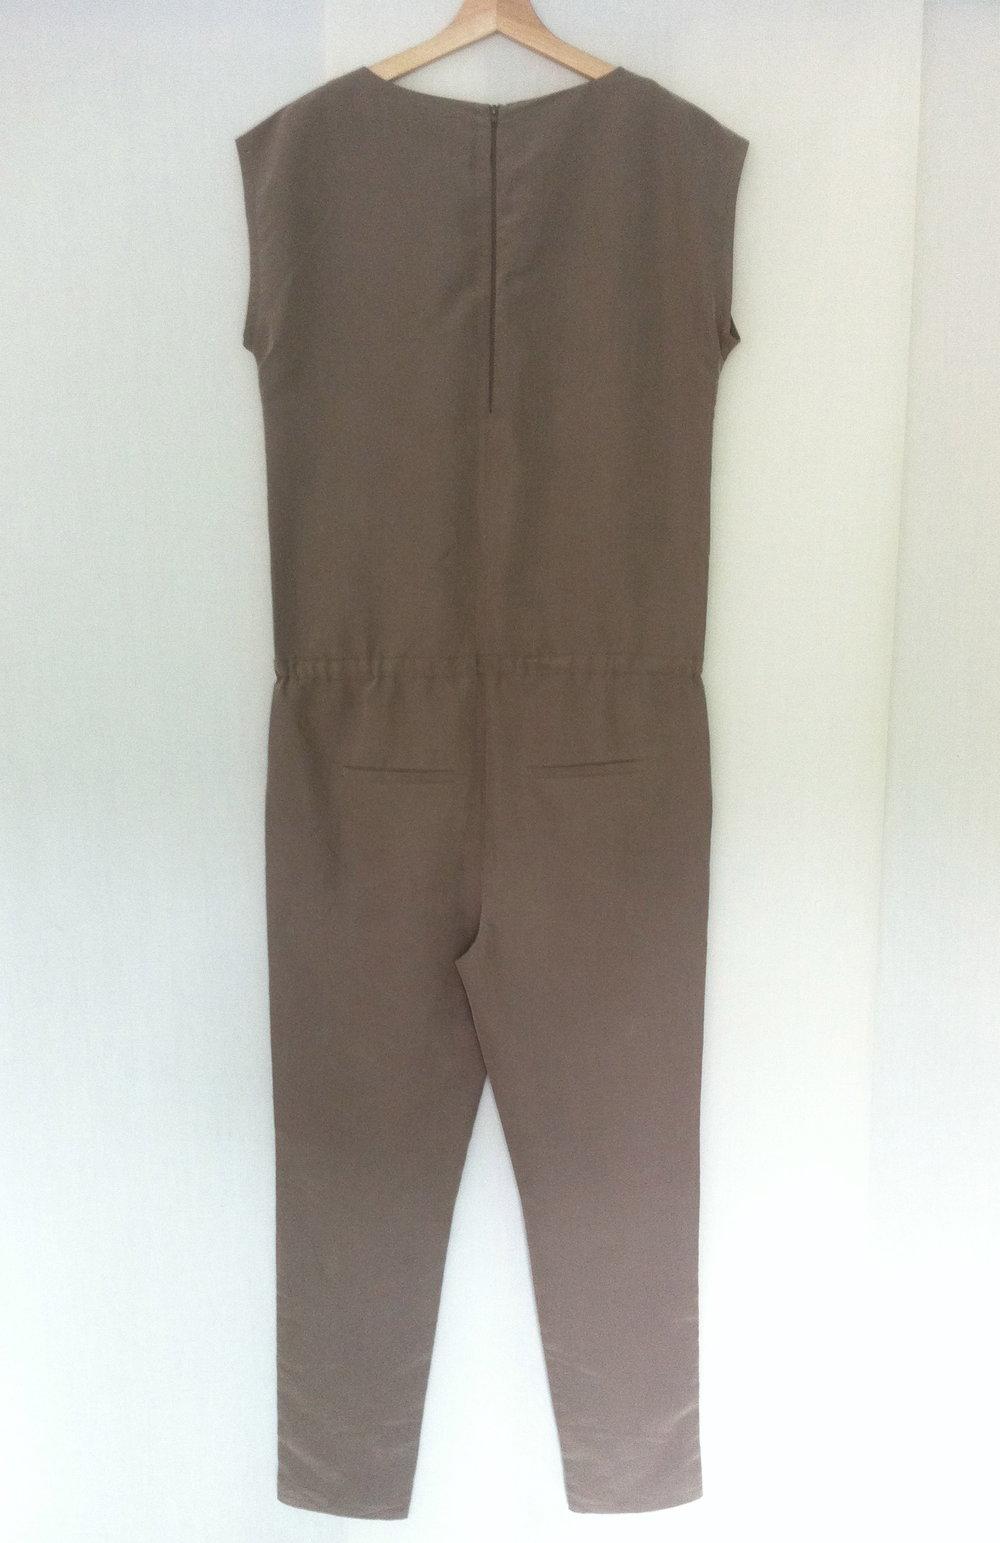 khaki overall jumpsuit clean hochzeit. Black Bedroom Furniture Sets. Home Design Ideas